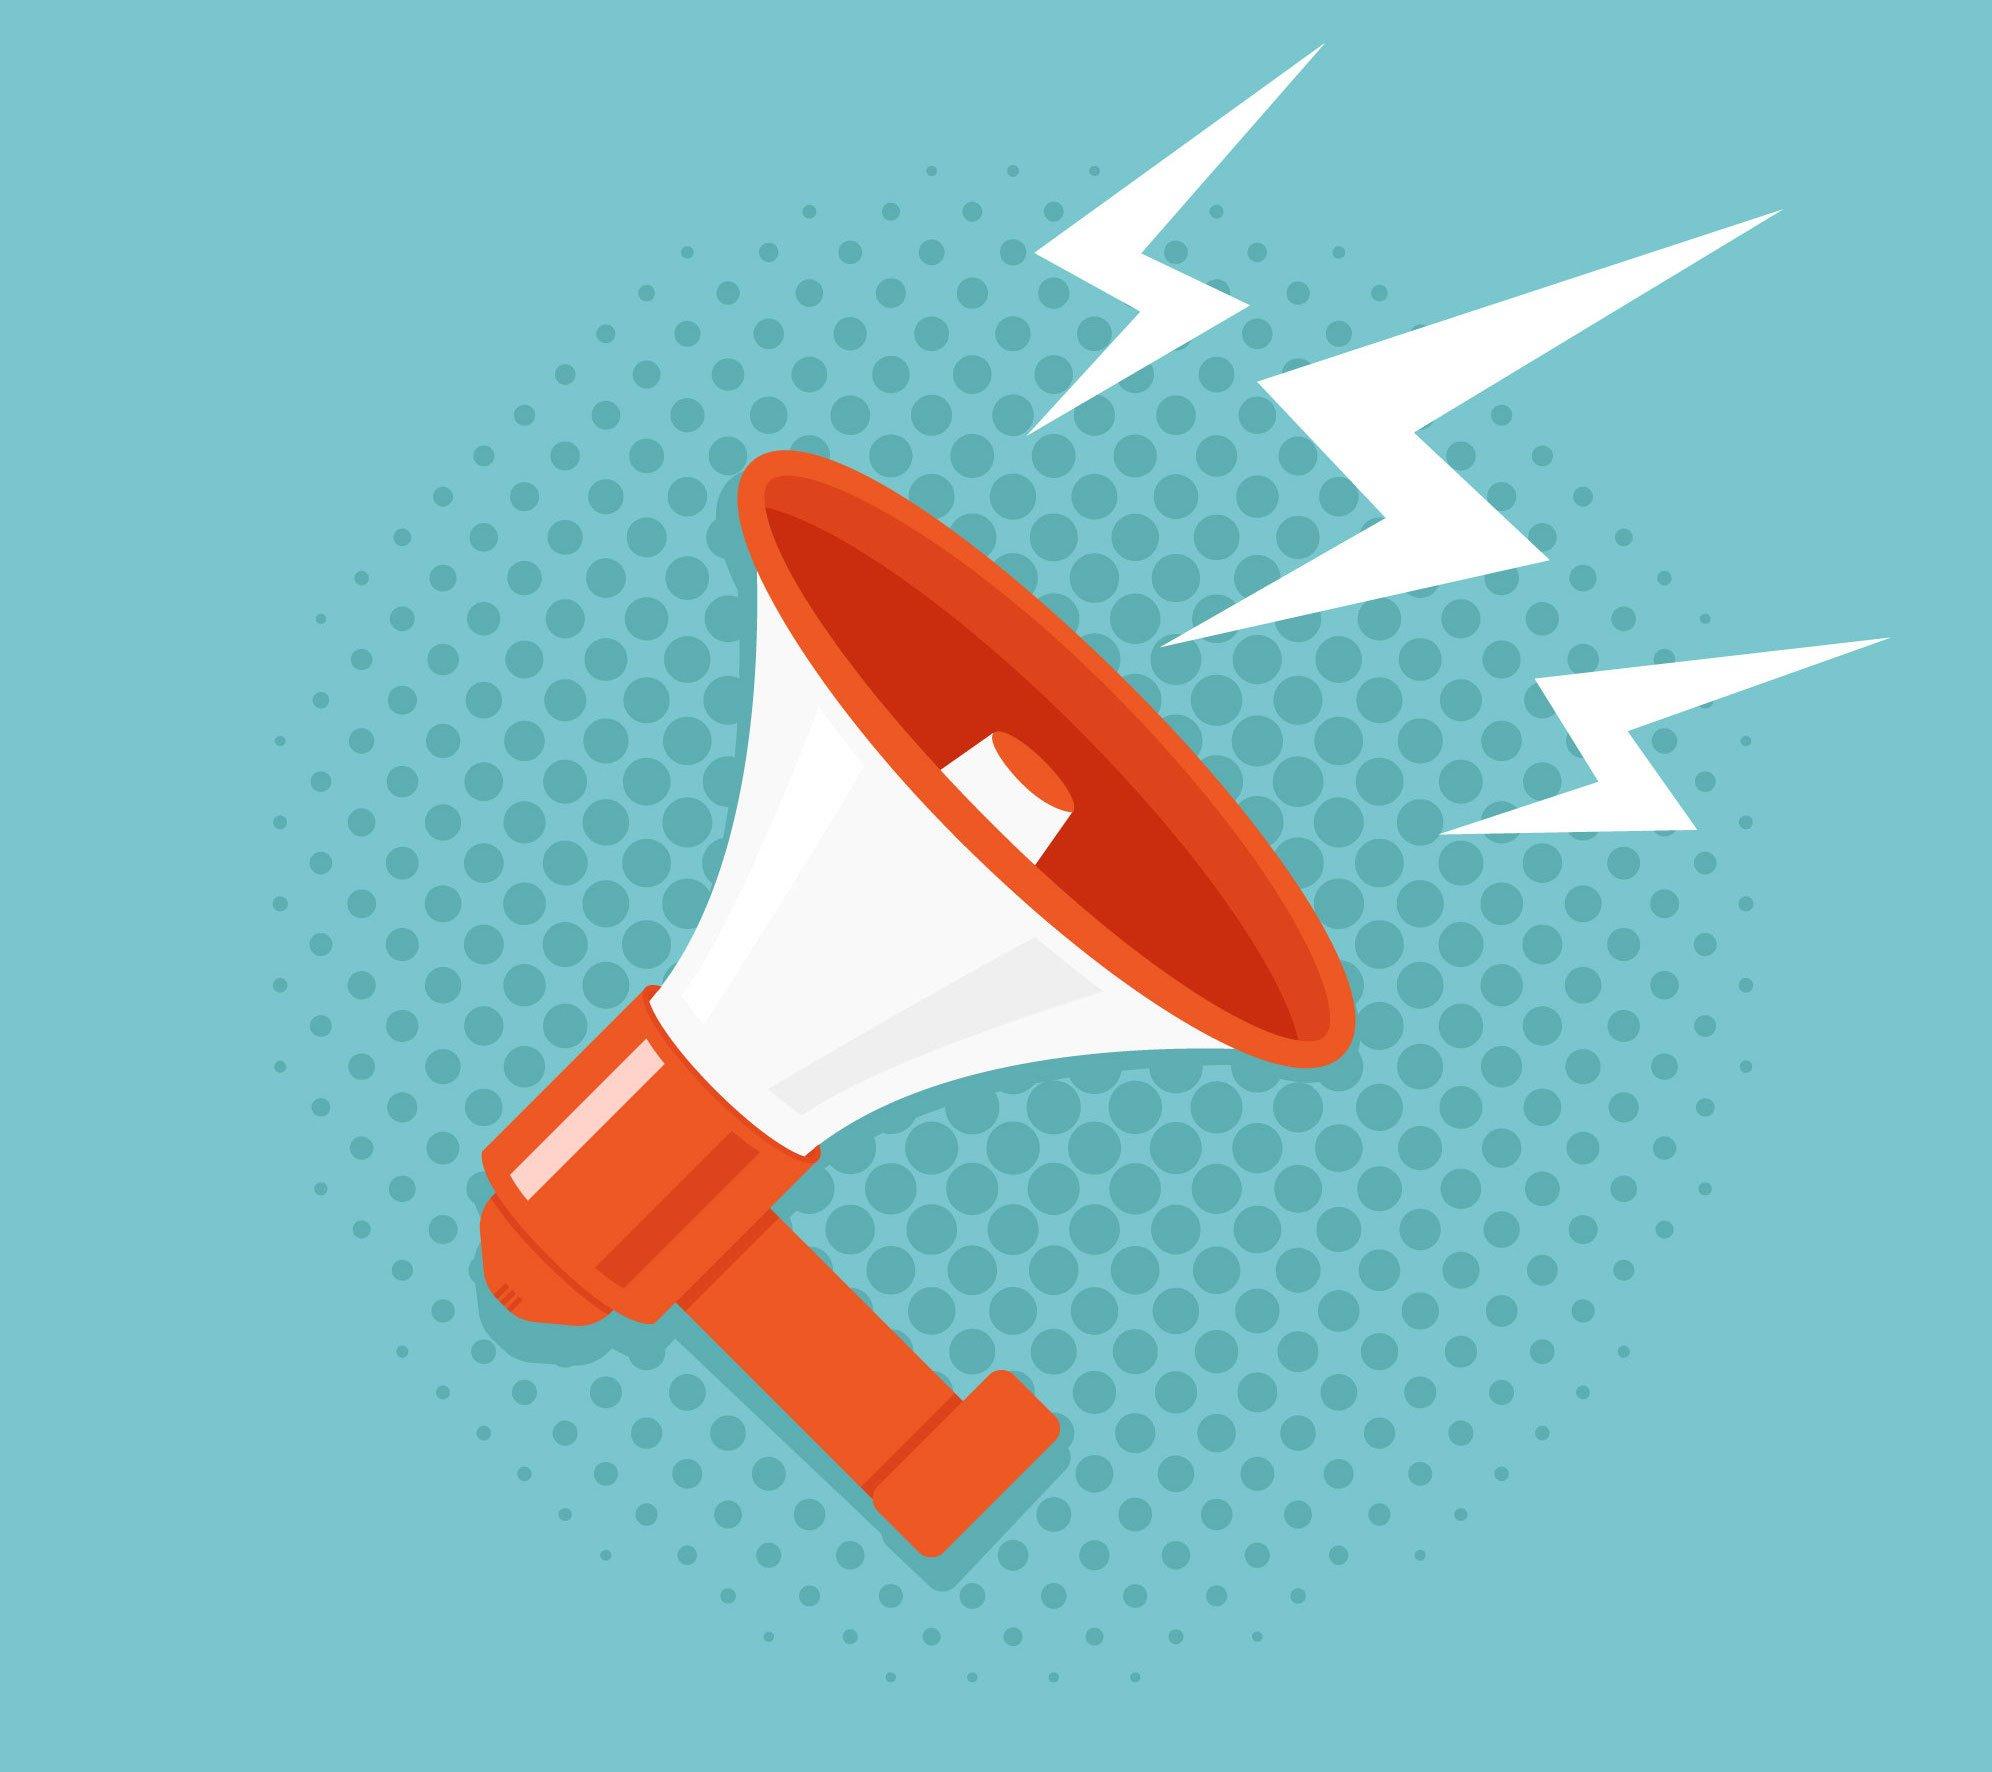 sale-megaphone-telstra-corportation-ltd-asx-tls-share-price